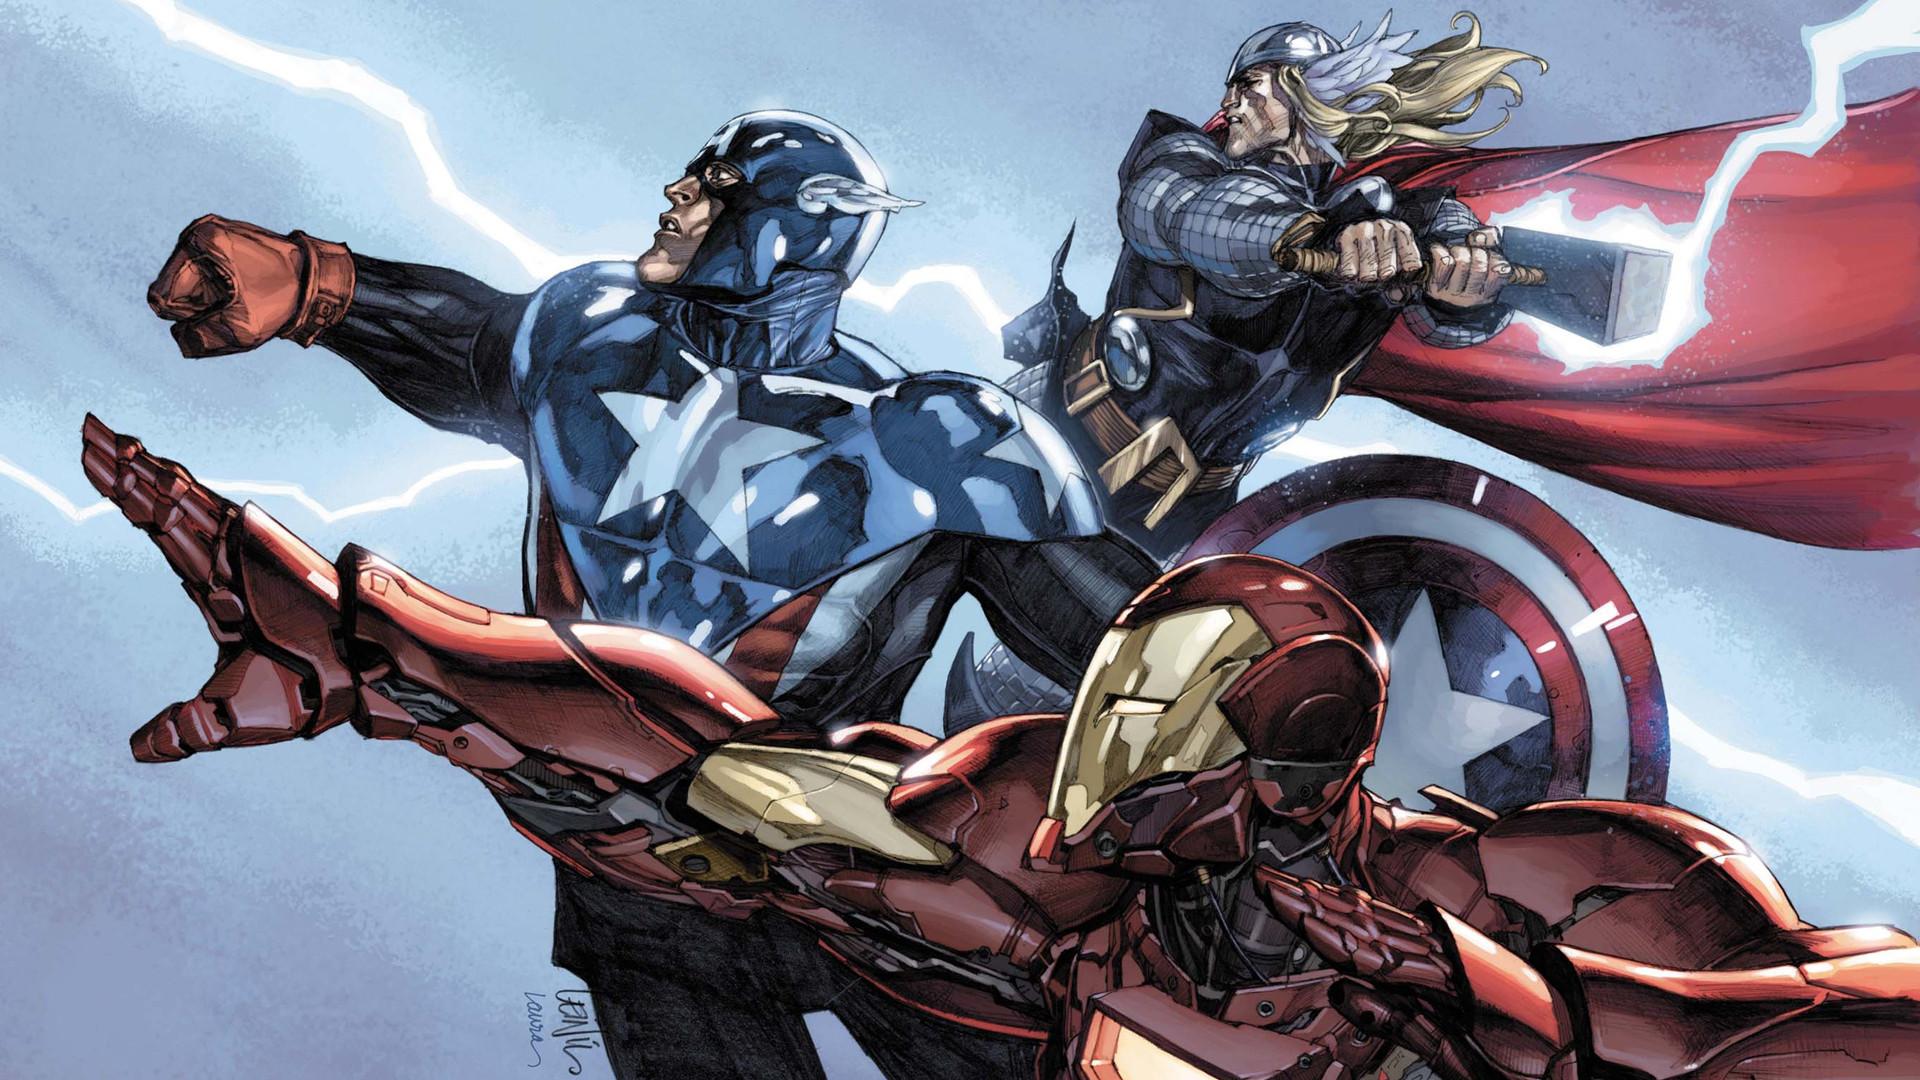 General 1920x1080 Captain America Marvel Comics superhero lightning